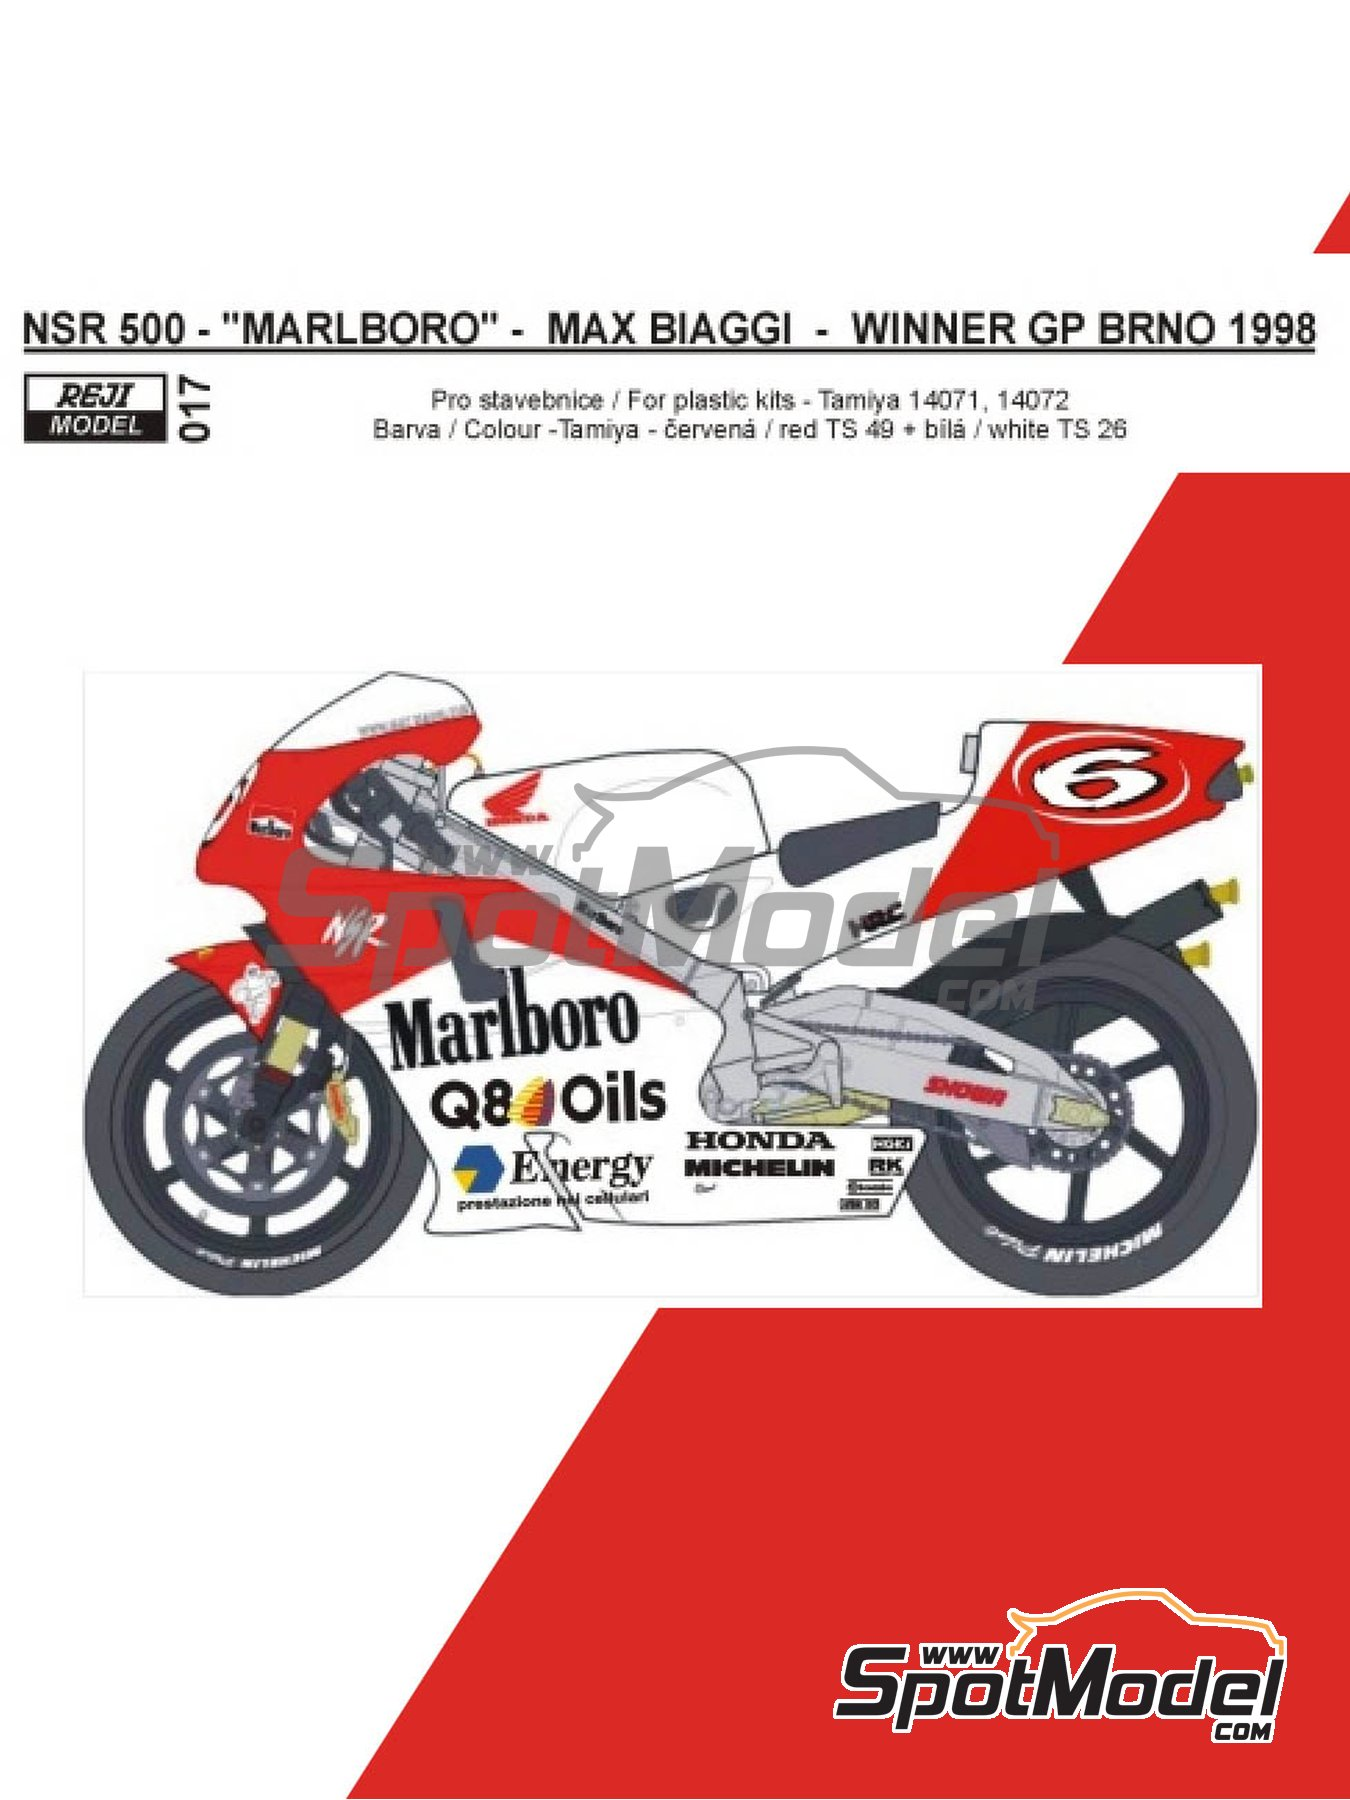 Honda NSR500 Marlboro - Brno Formula 1 Grand Prix, Brno Moto GP Grand Prix 1998 | Marking / livery in 1/12 scale manufactured by Reji Model (ref.REJI-017) image